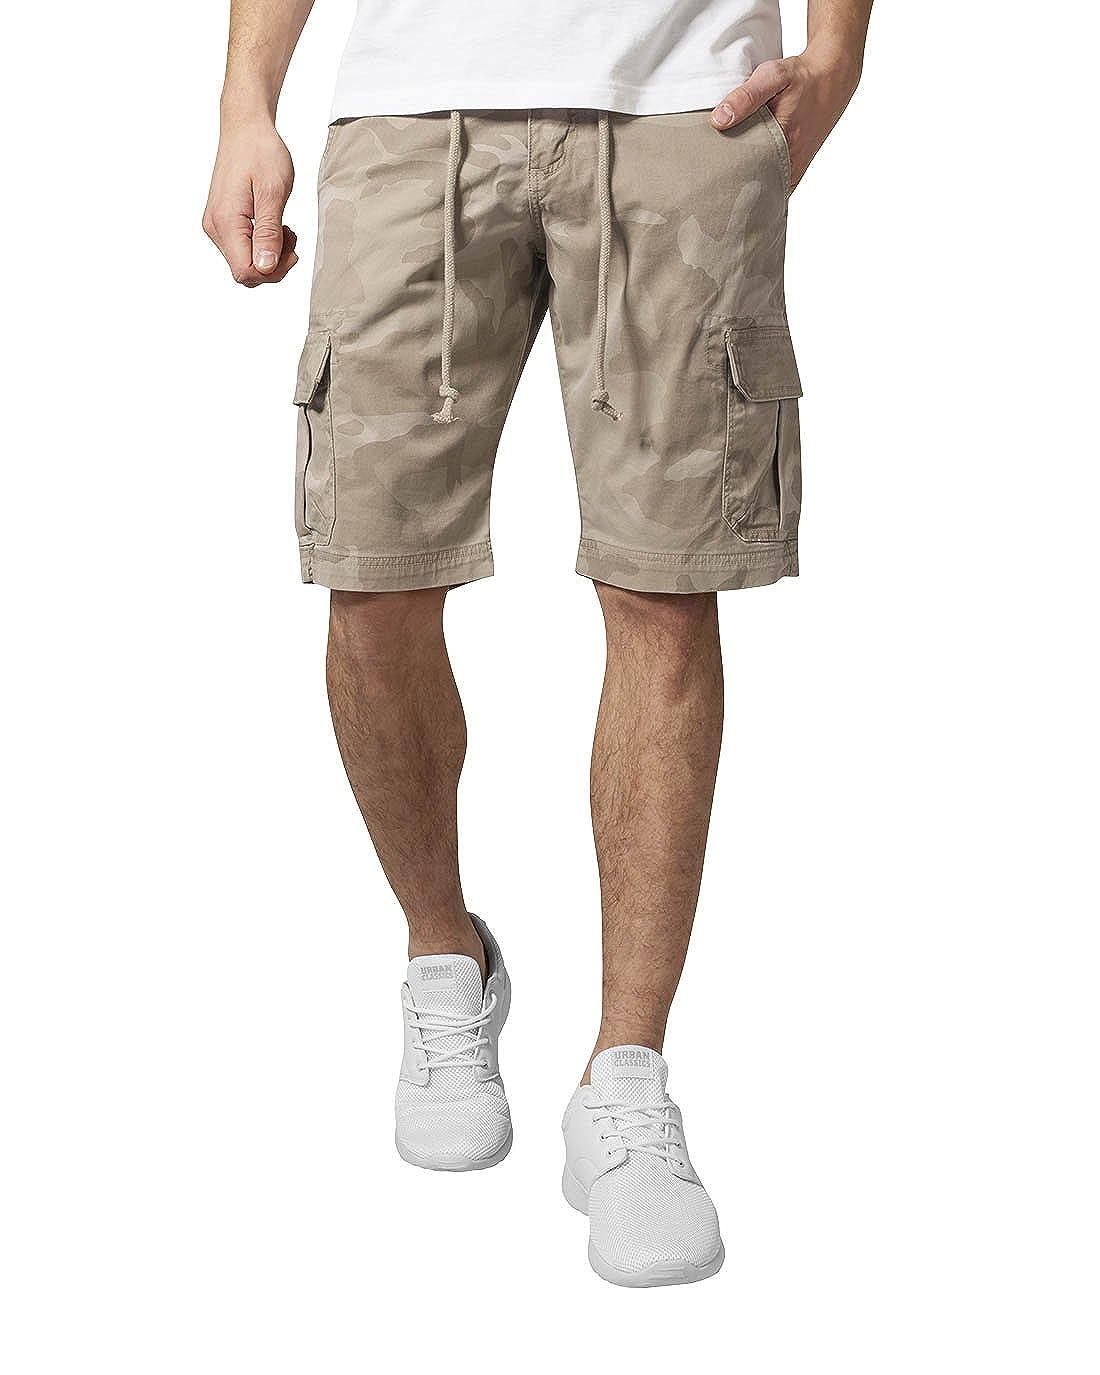 d2729b1fe3 Urban Classic Men's Camo Cargo Shorts: Amazon.co.uk: Clothing